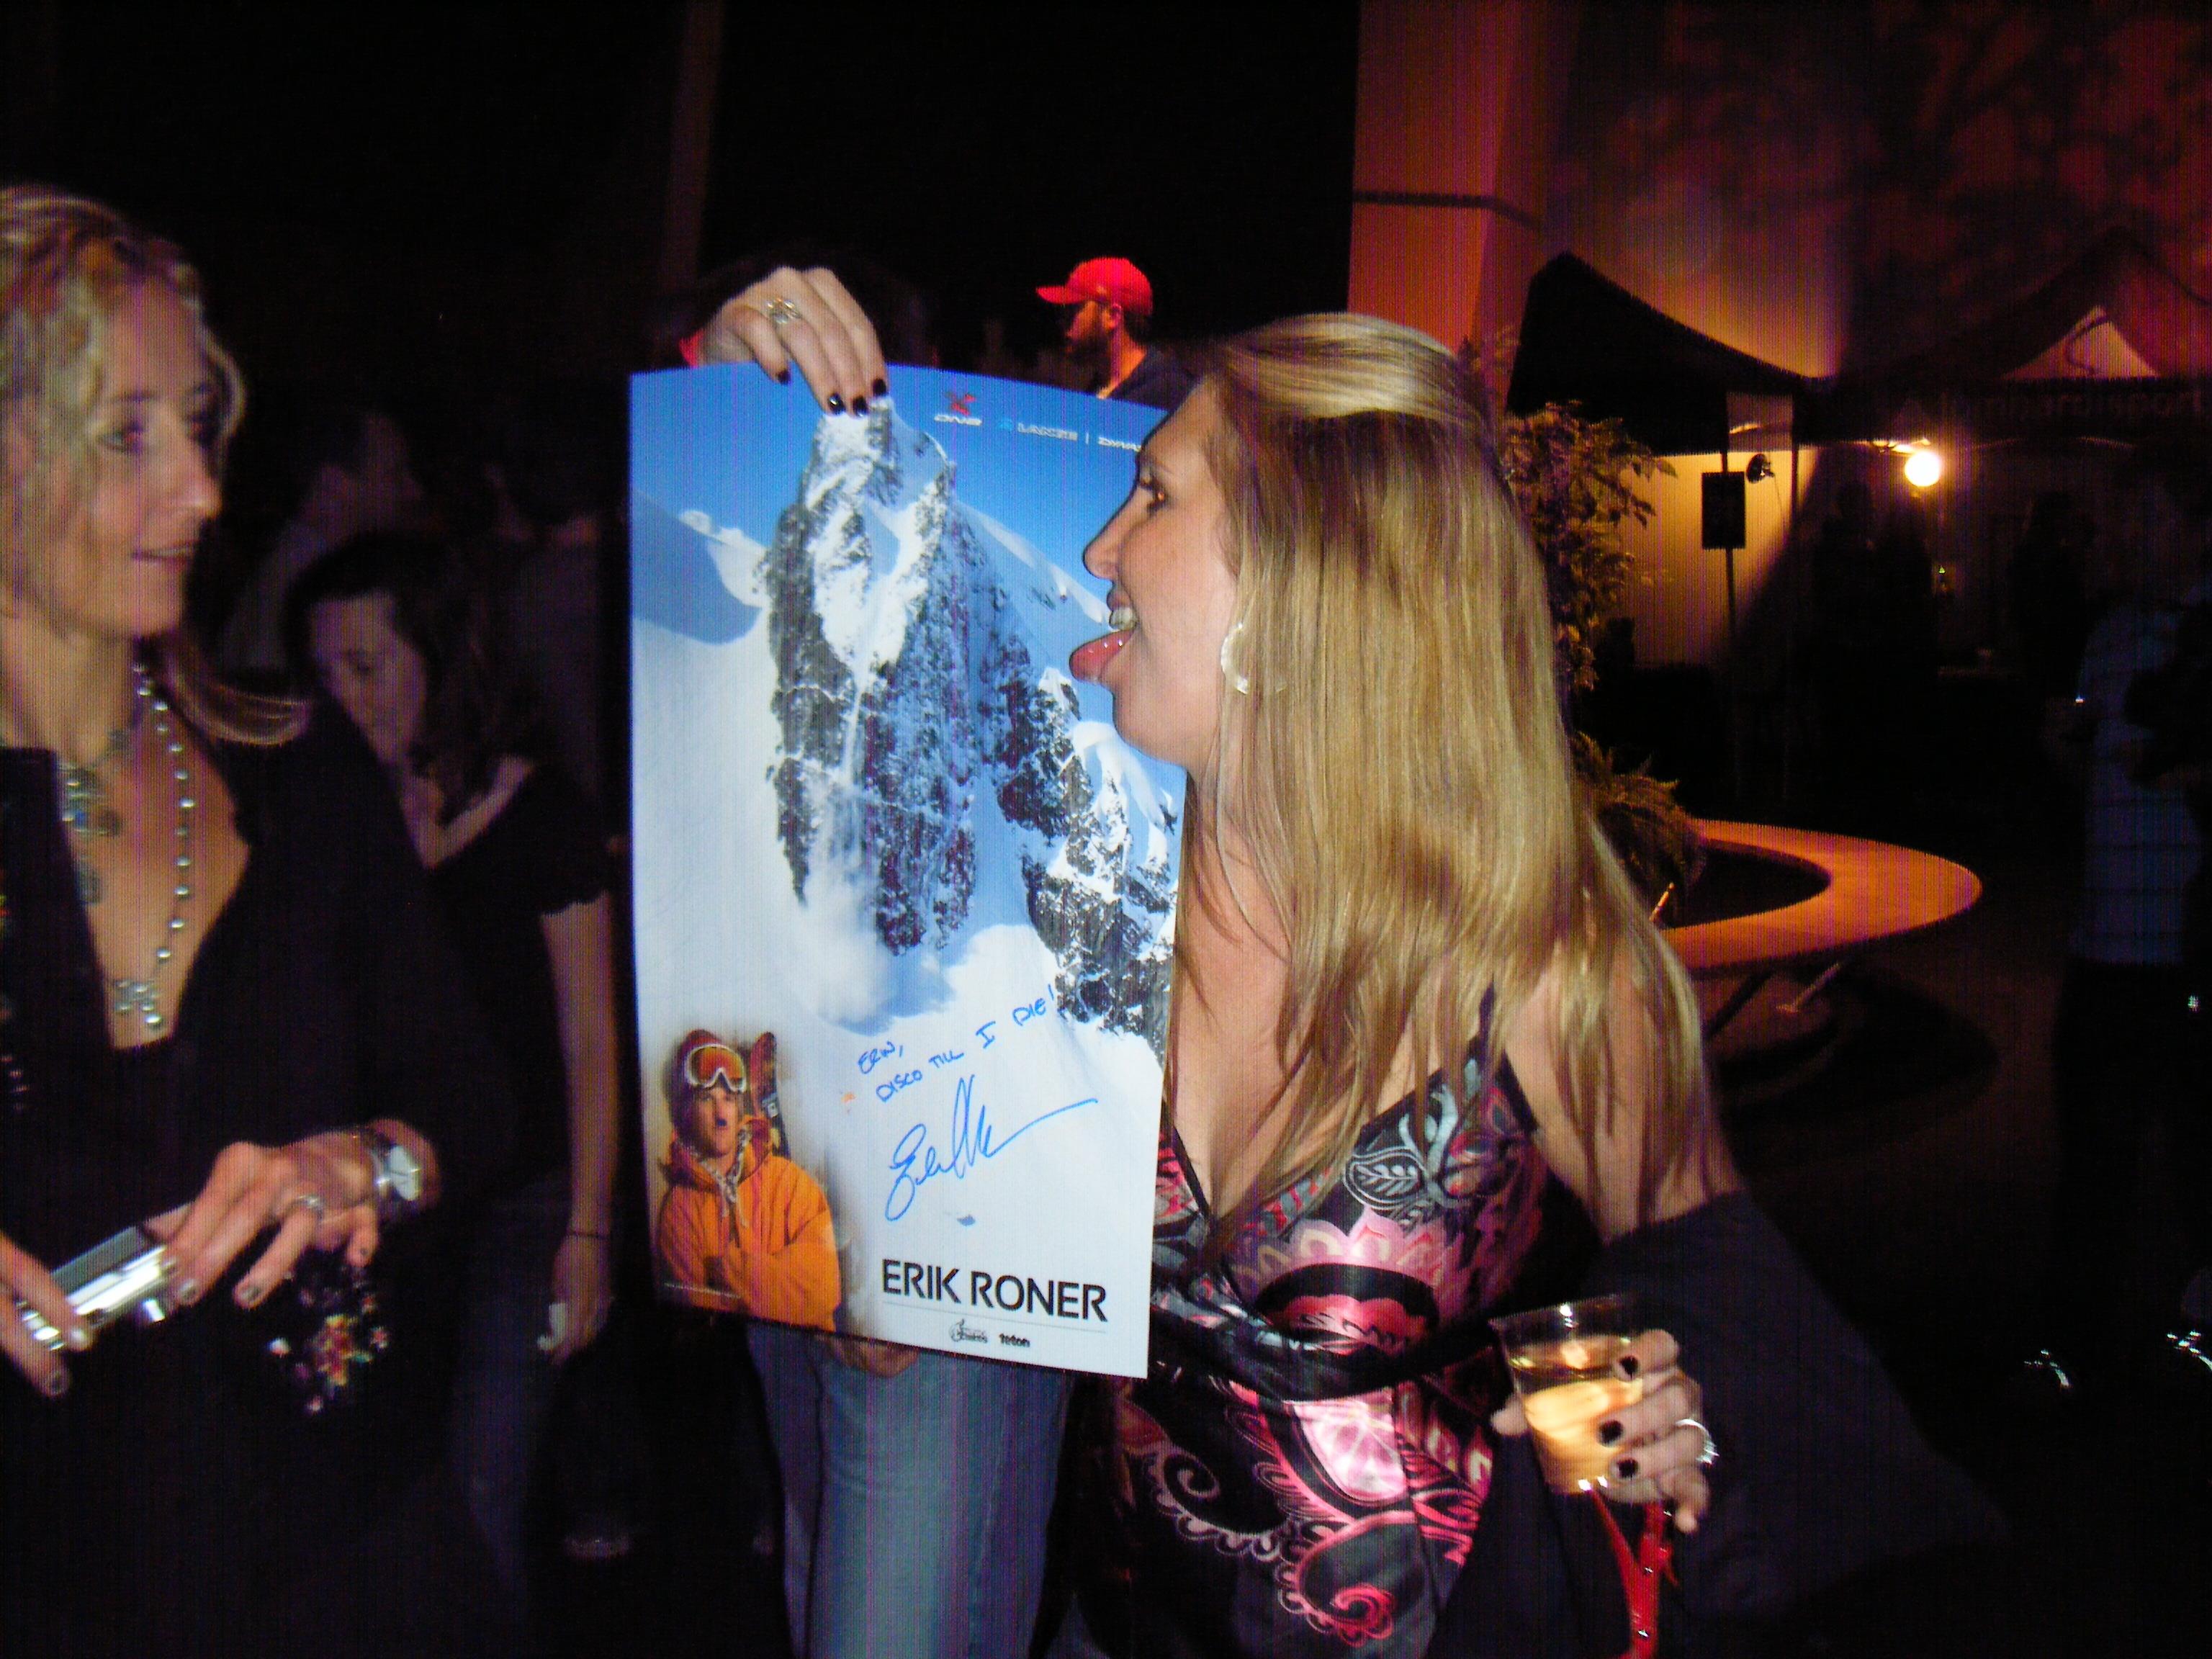 Licking A Poster Of Erik Roner